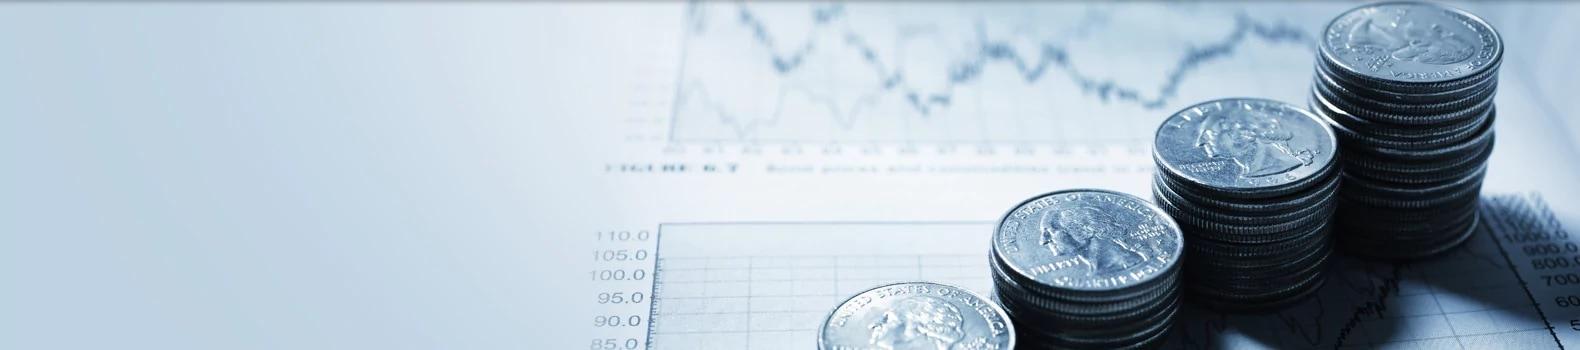 Business deposit rates